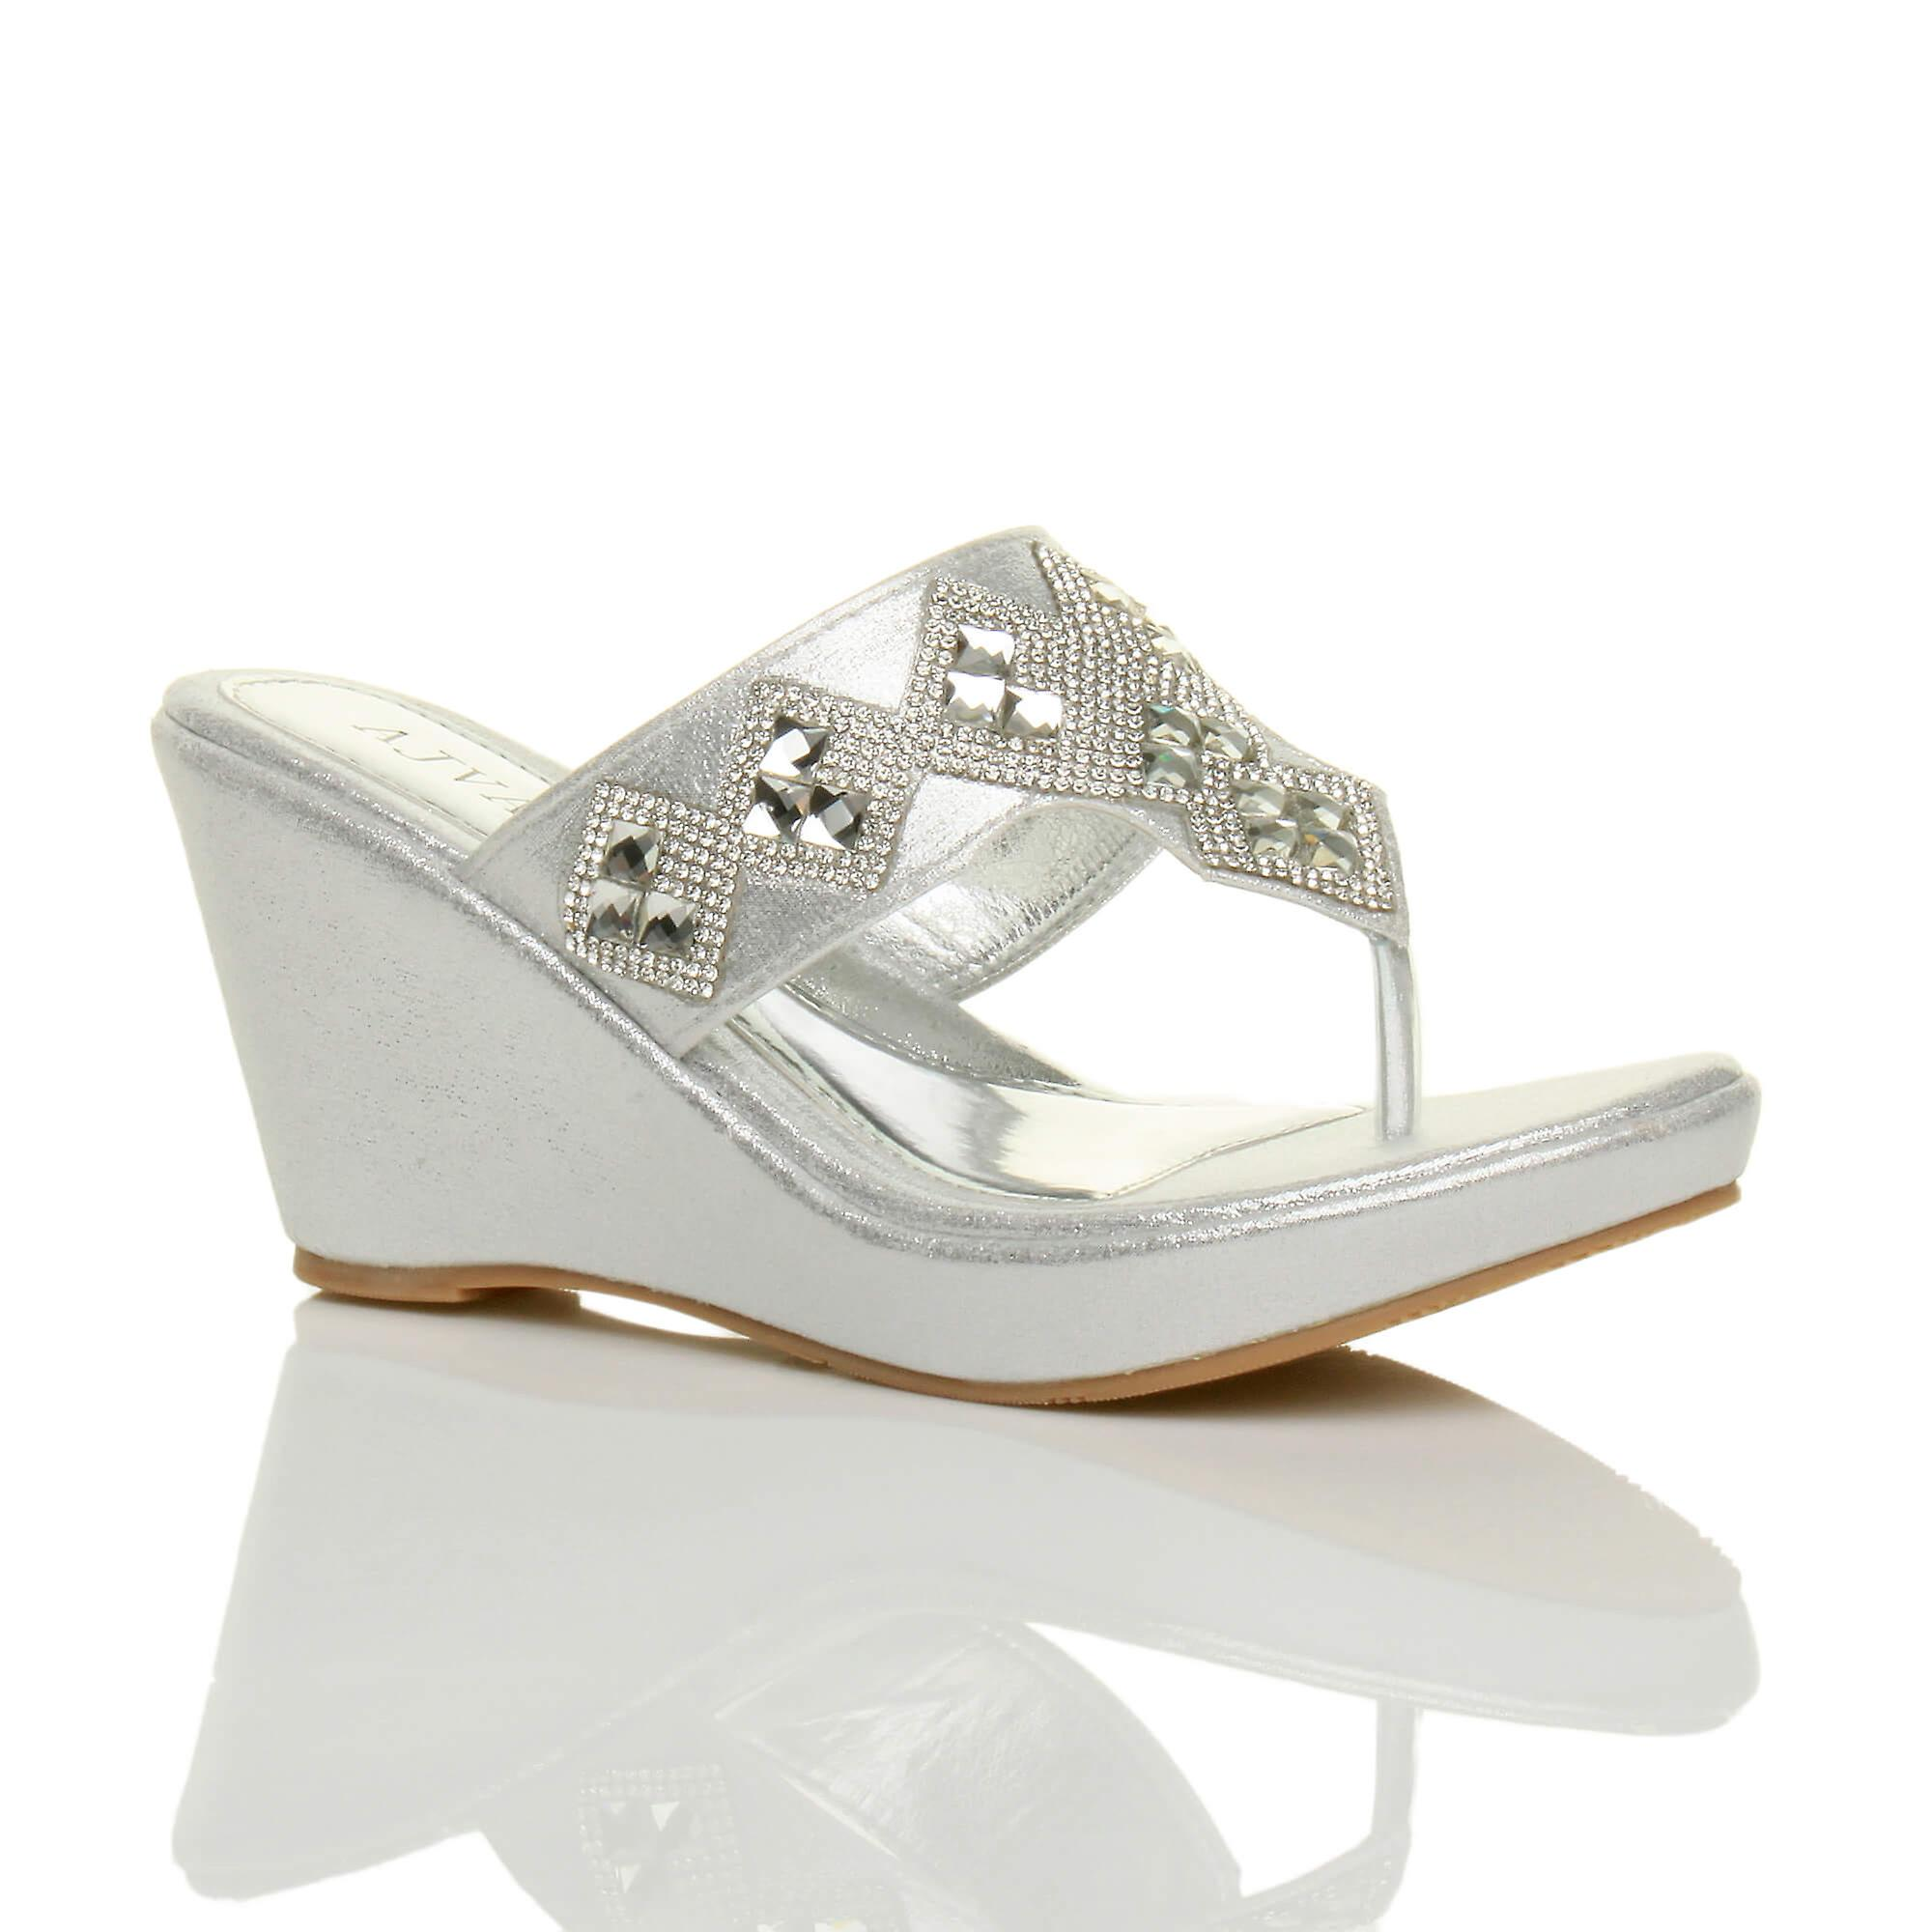 toe t platform high diamante post heel mules bar womens Ajvani sandals wedge xnqYWFqC